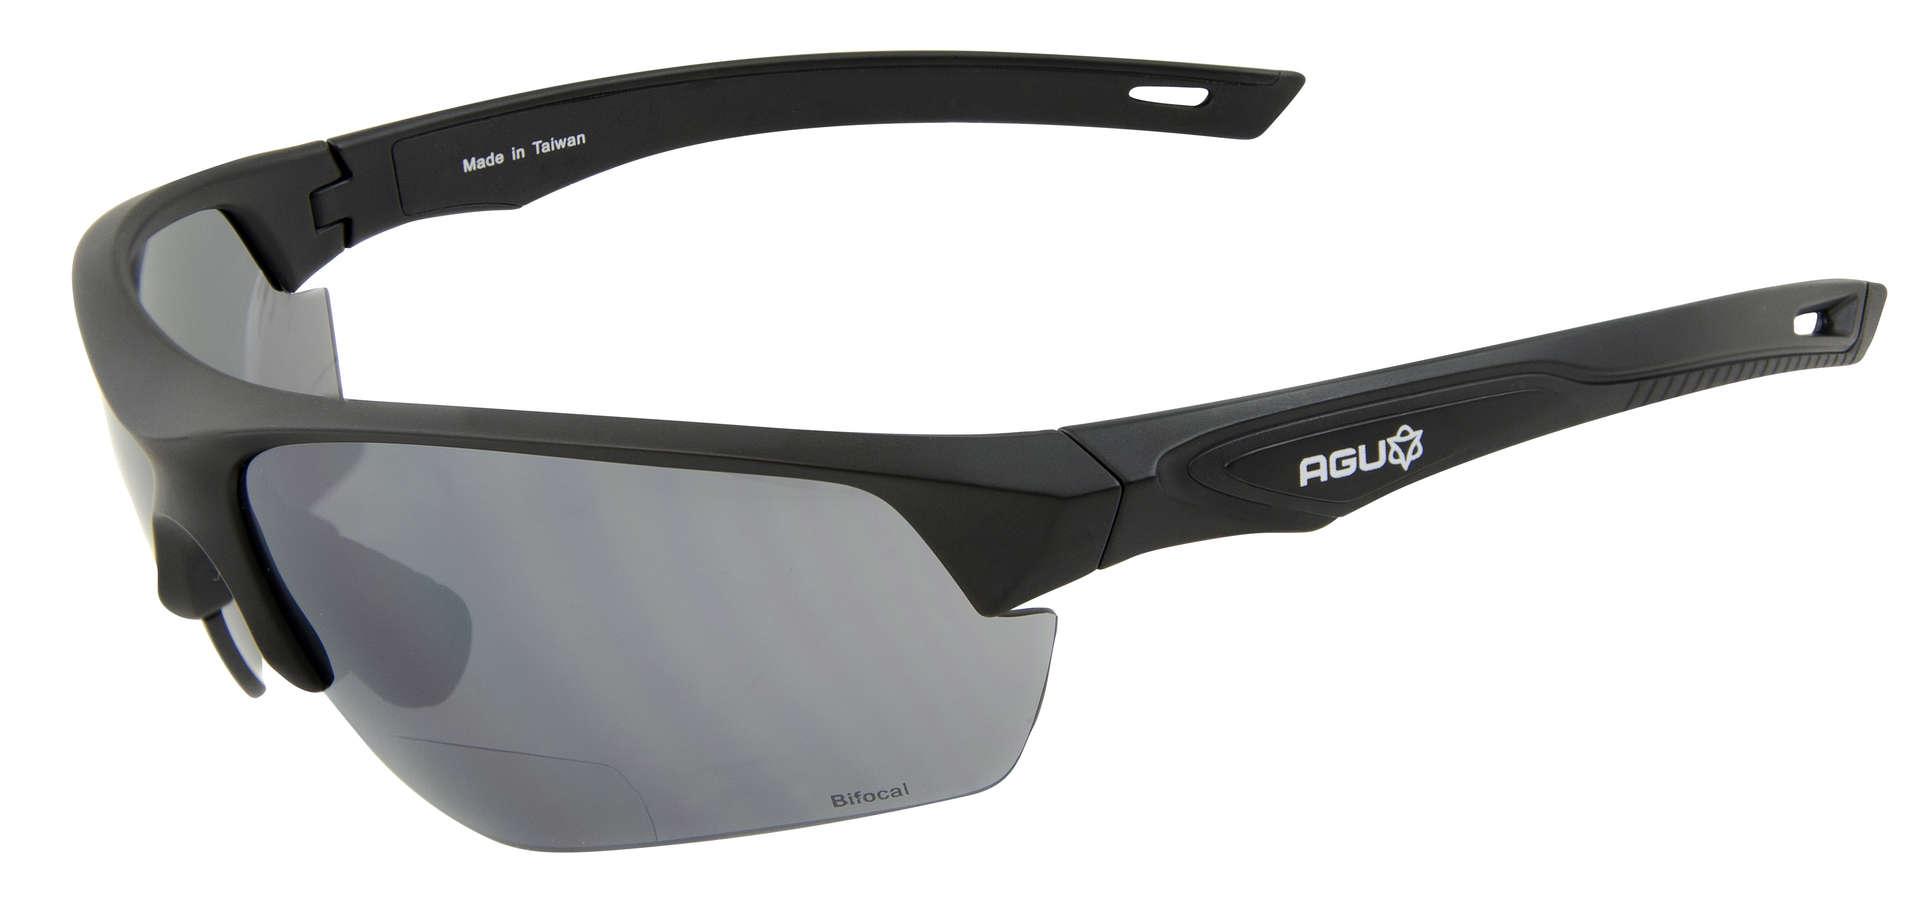 4fda7e321bd46f AGU Medina Sportbril op Sterkte Zwart koop je bij Futurumshop.nl